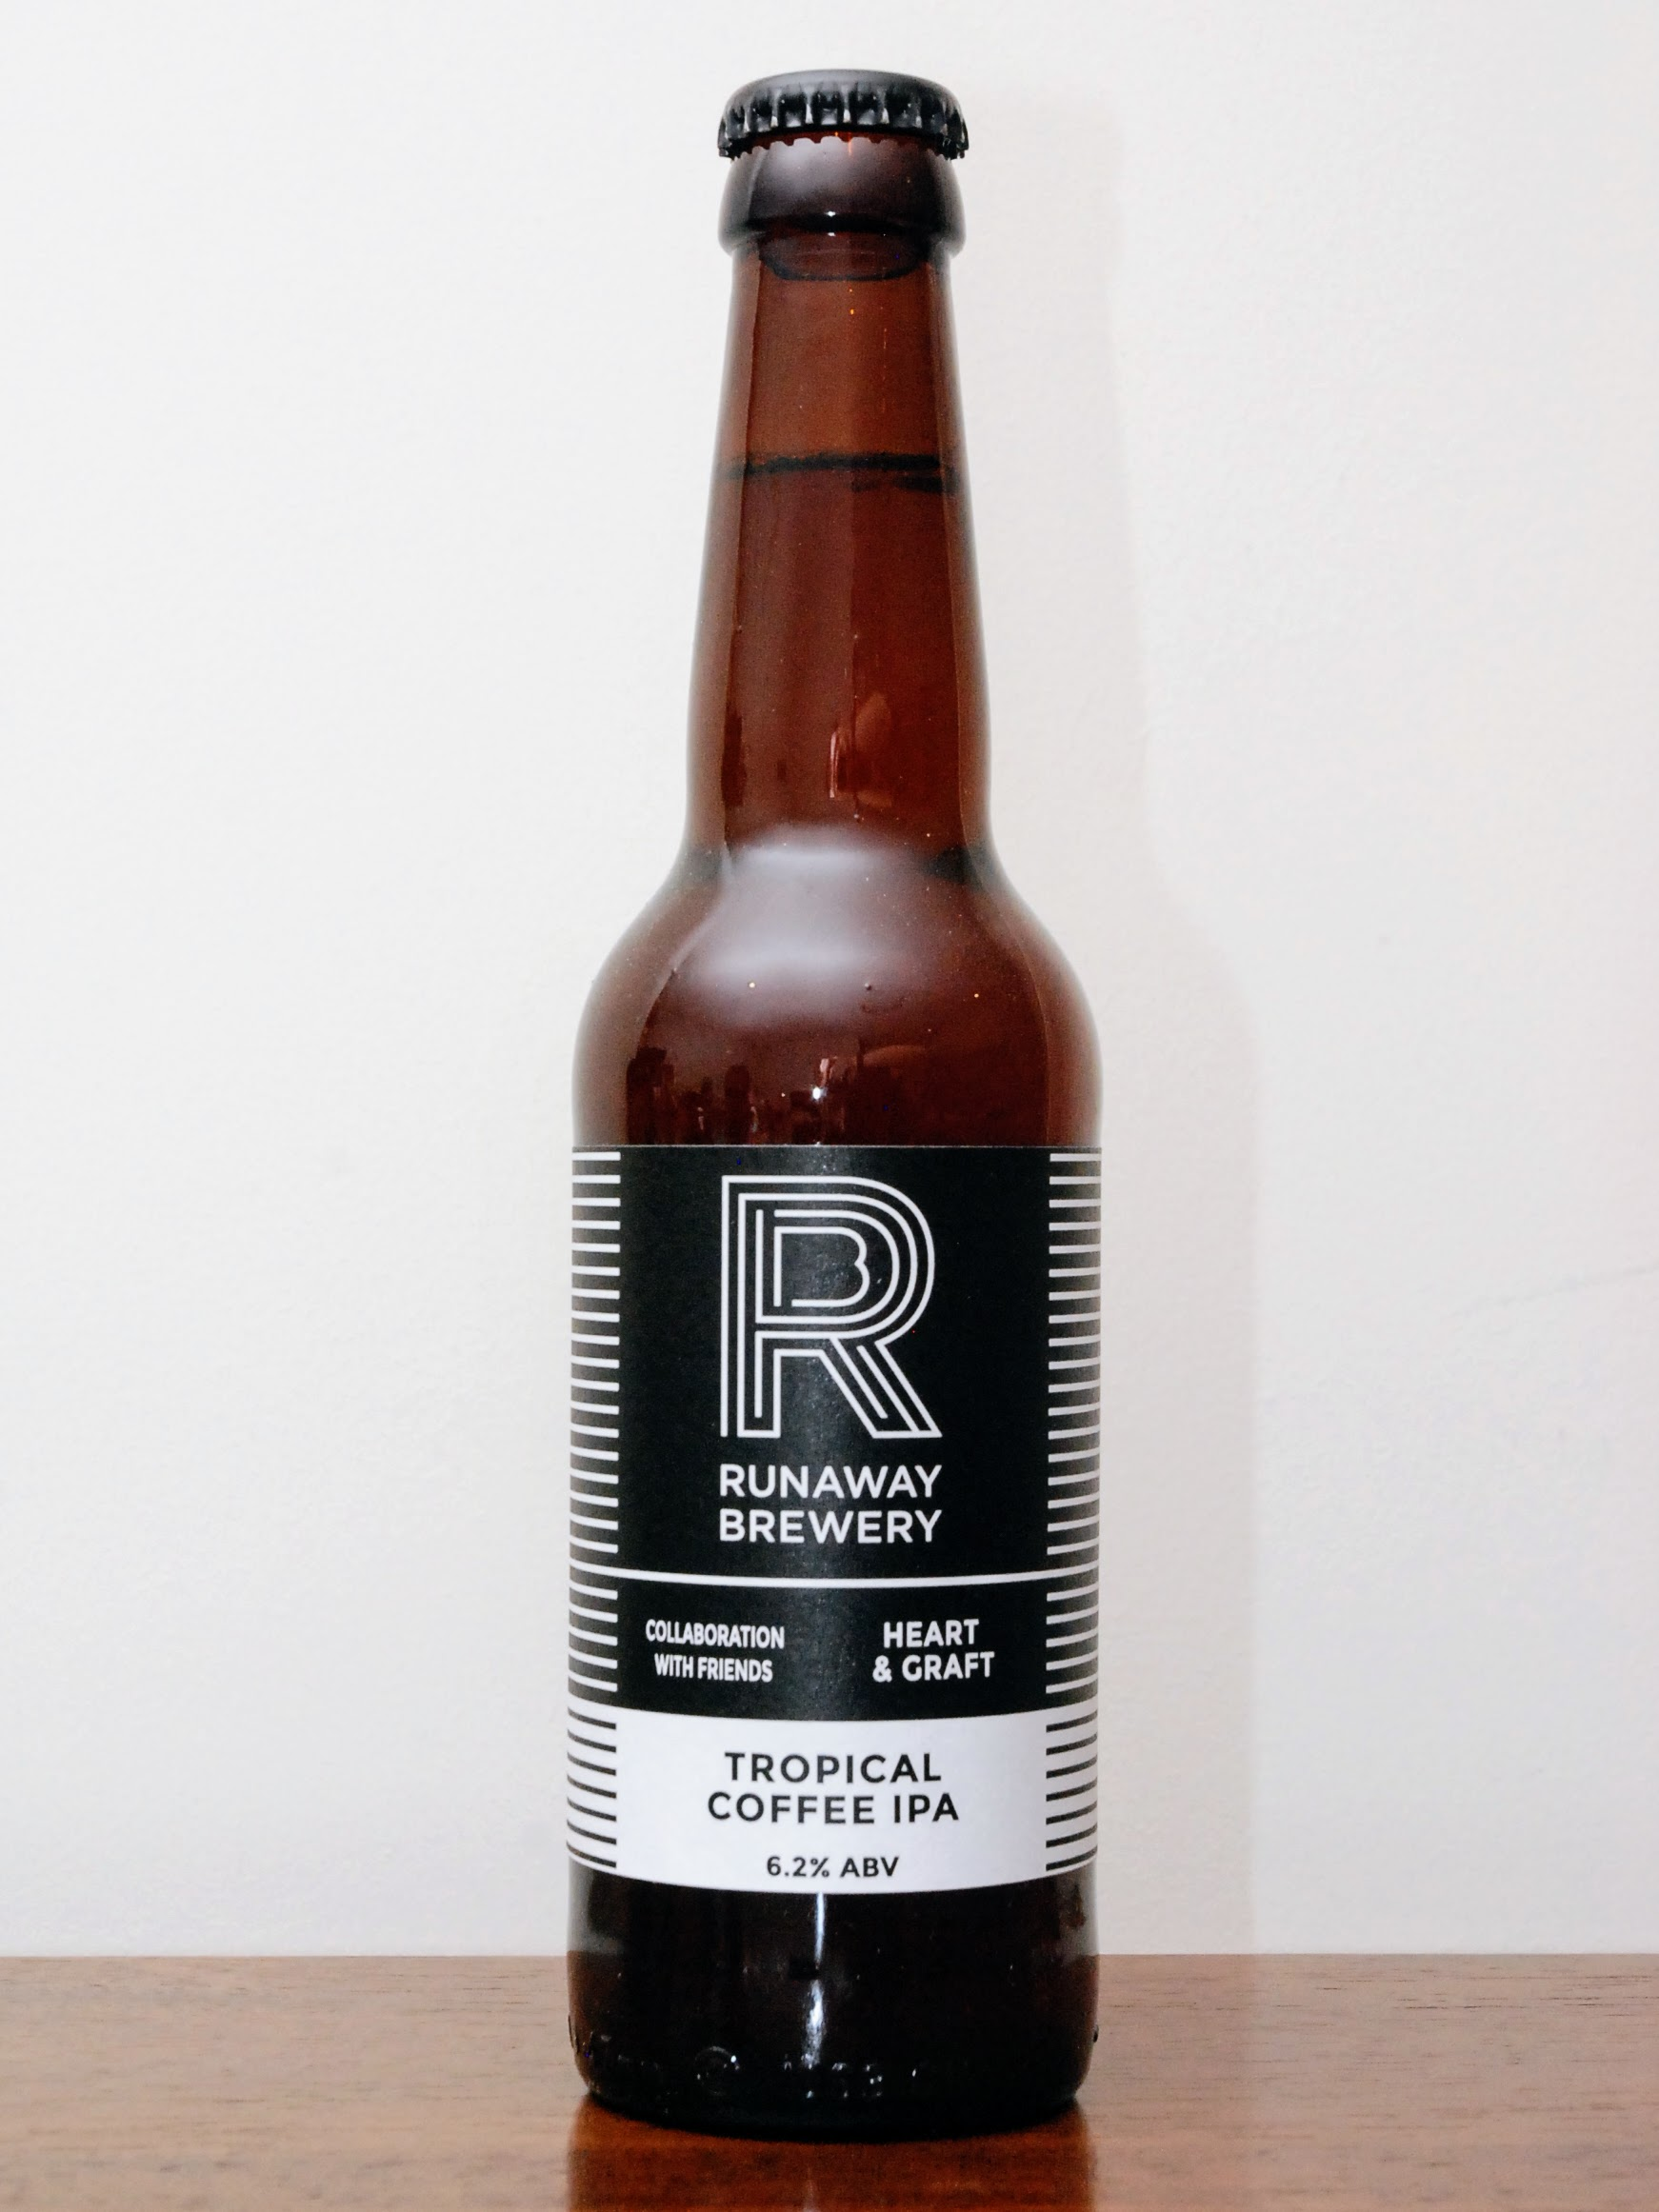 Runaway Brewery, Tropical Coffee IPA